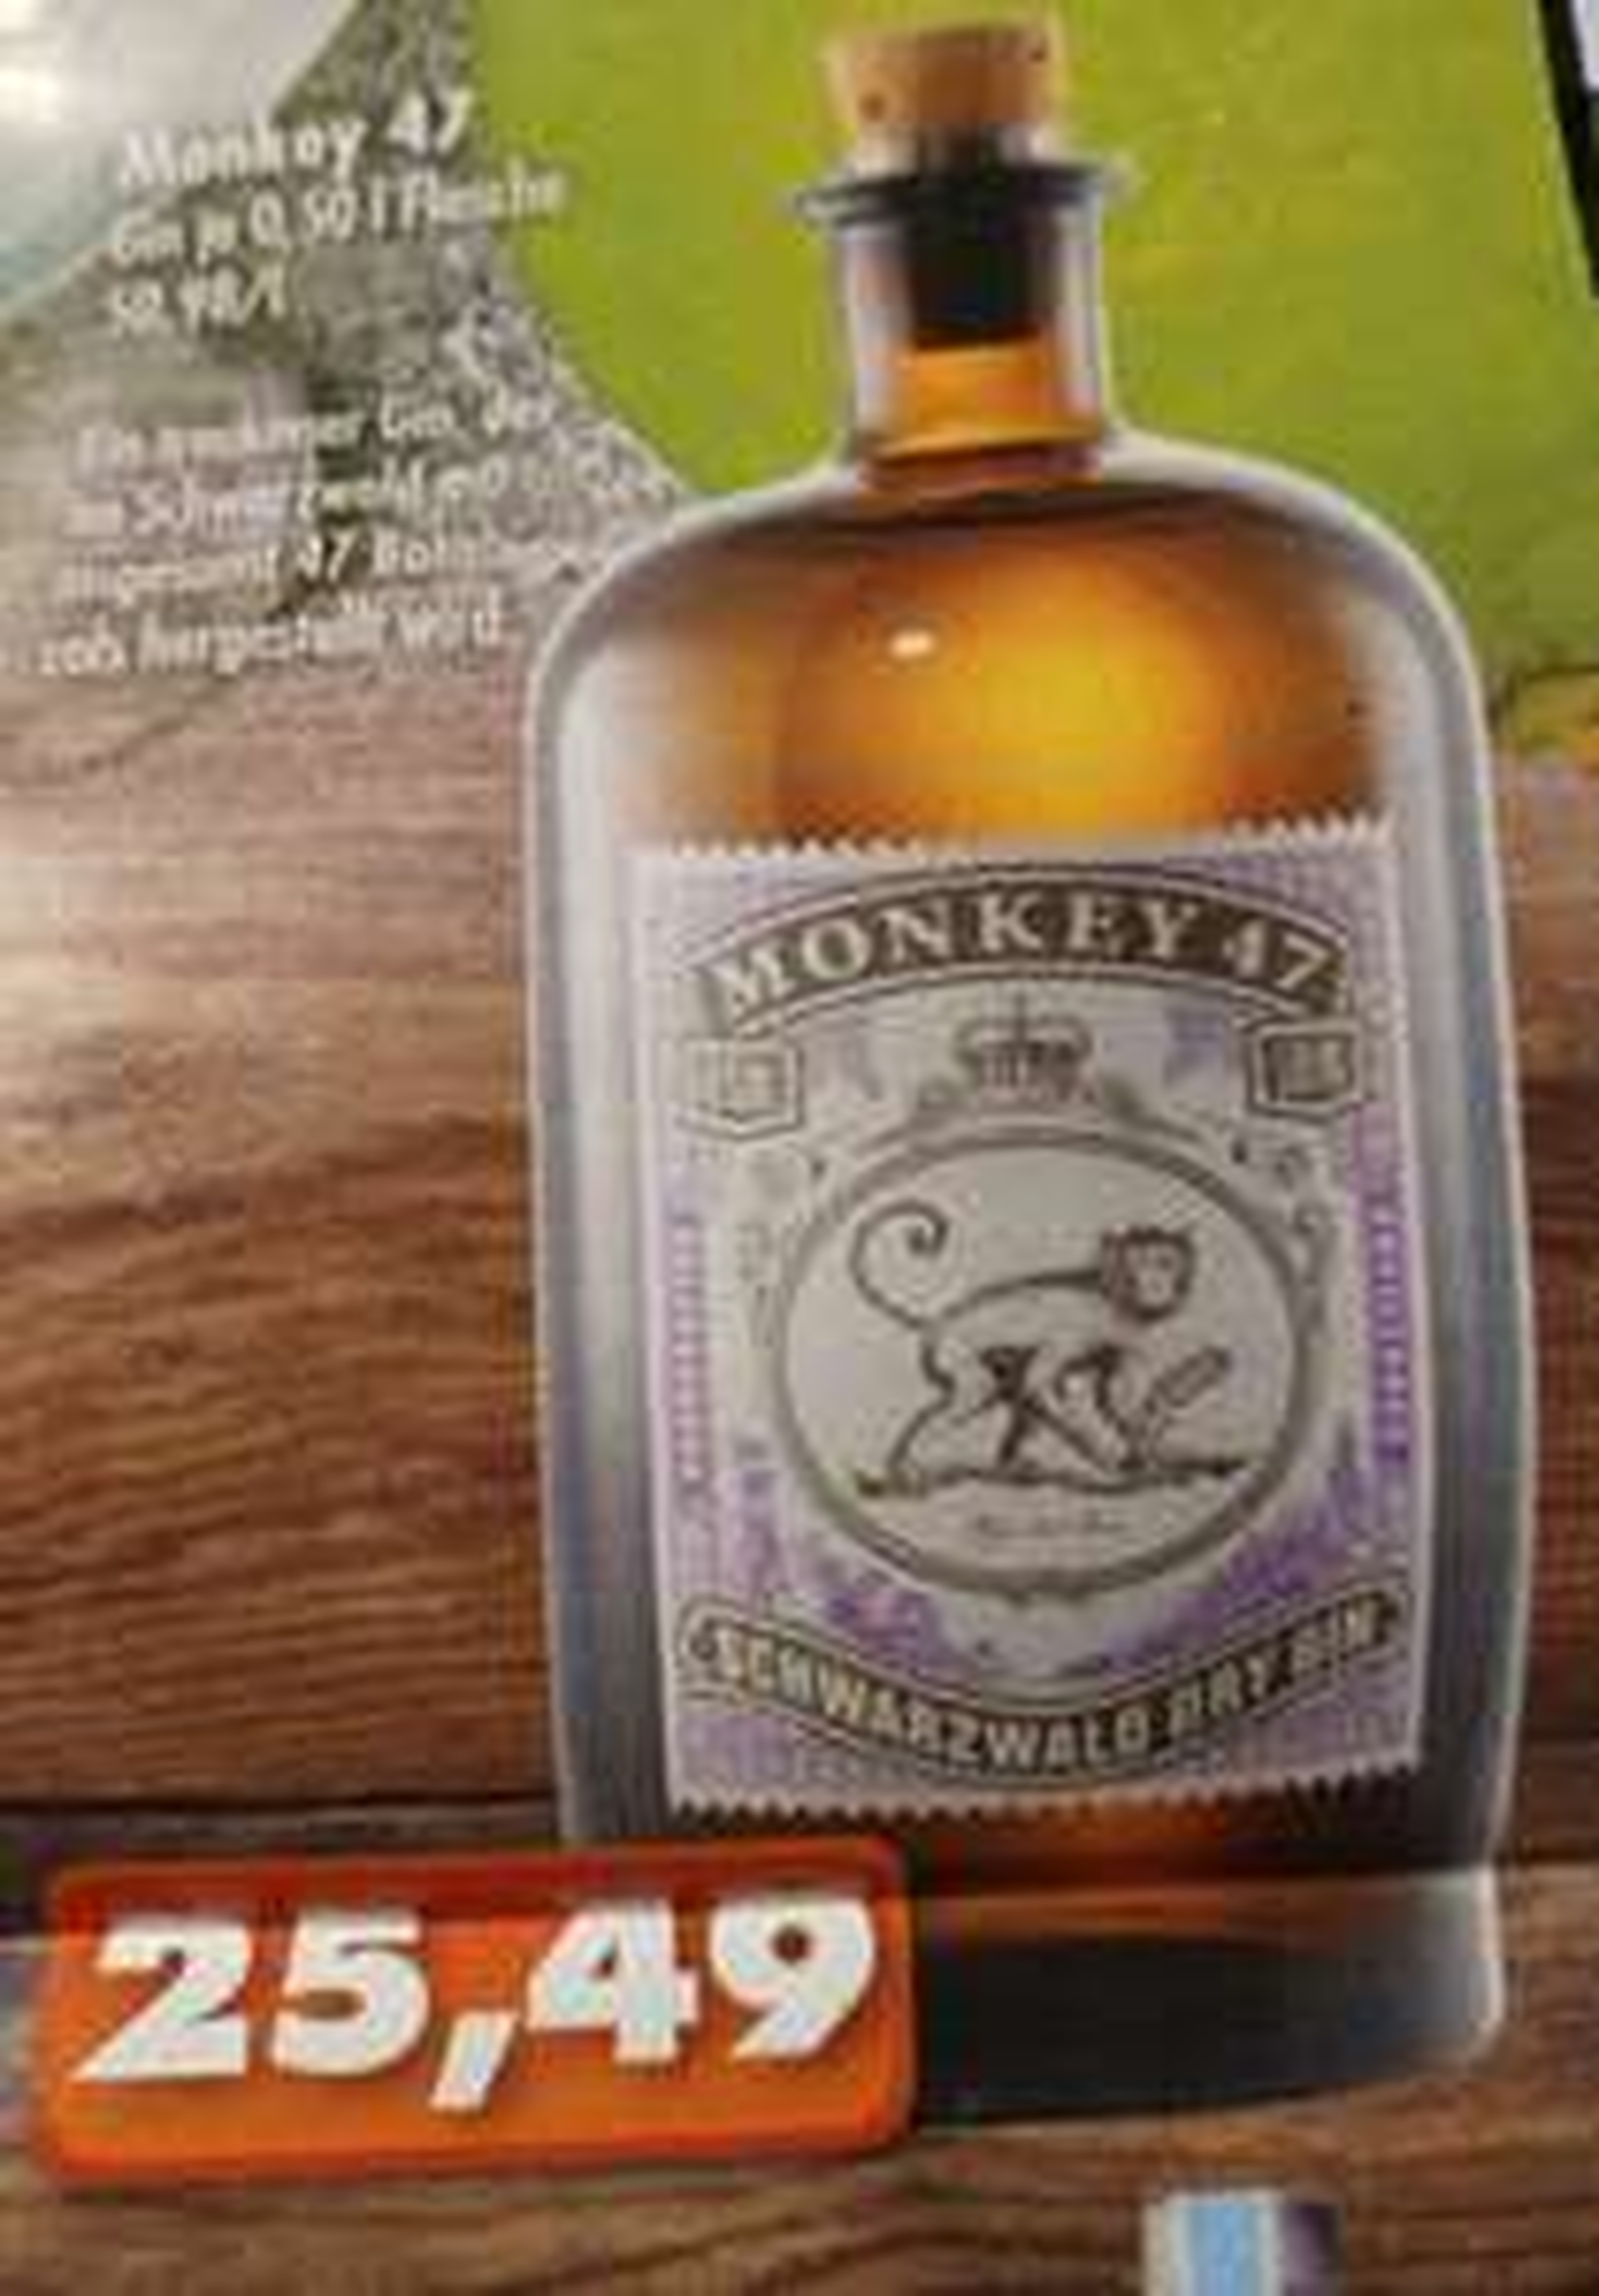 [Lokal Vollgut-Märkte Plz 3xxxx] Monkey 47 Gin für 25,49